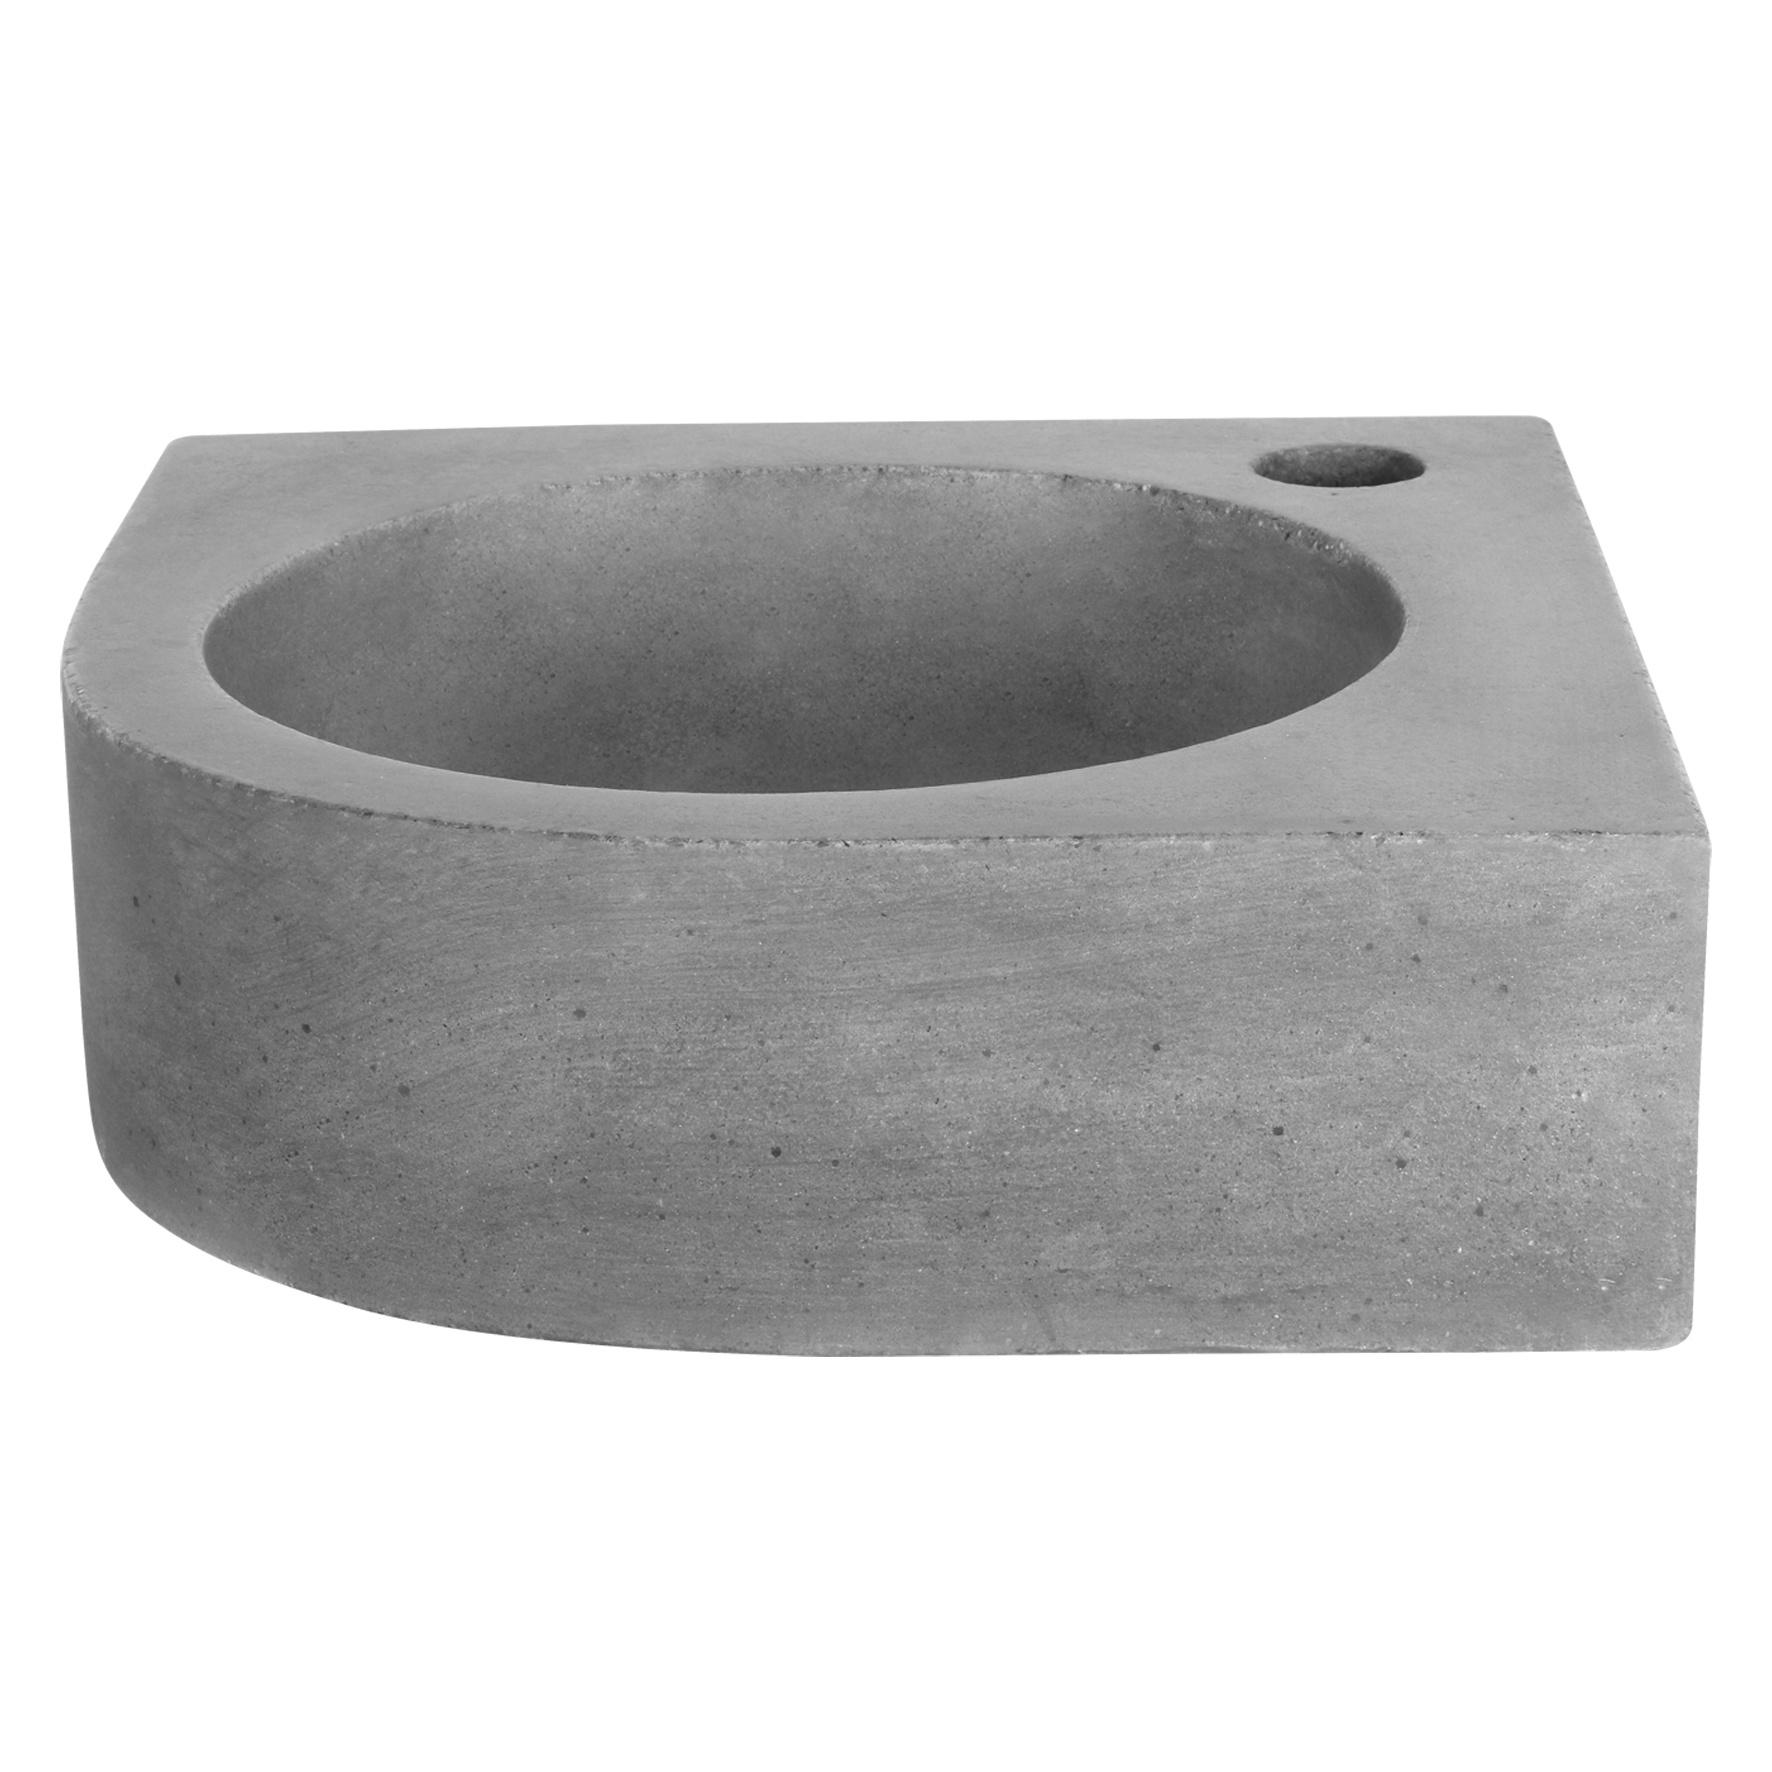 Cleo hoekfontein – Beton donkergrijs 31,5 x 31,5 x 10 cm-2